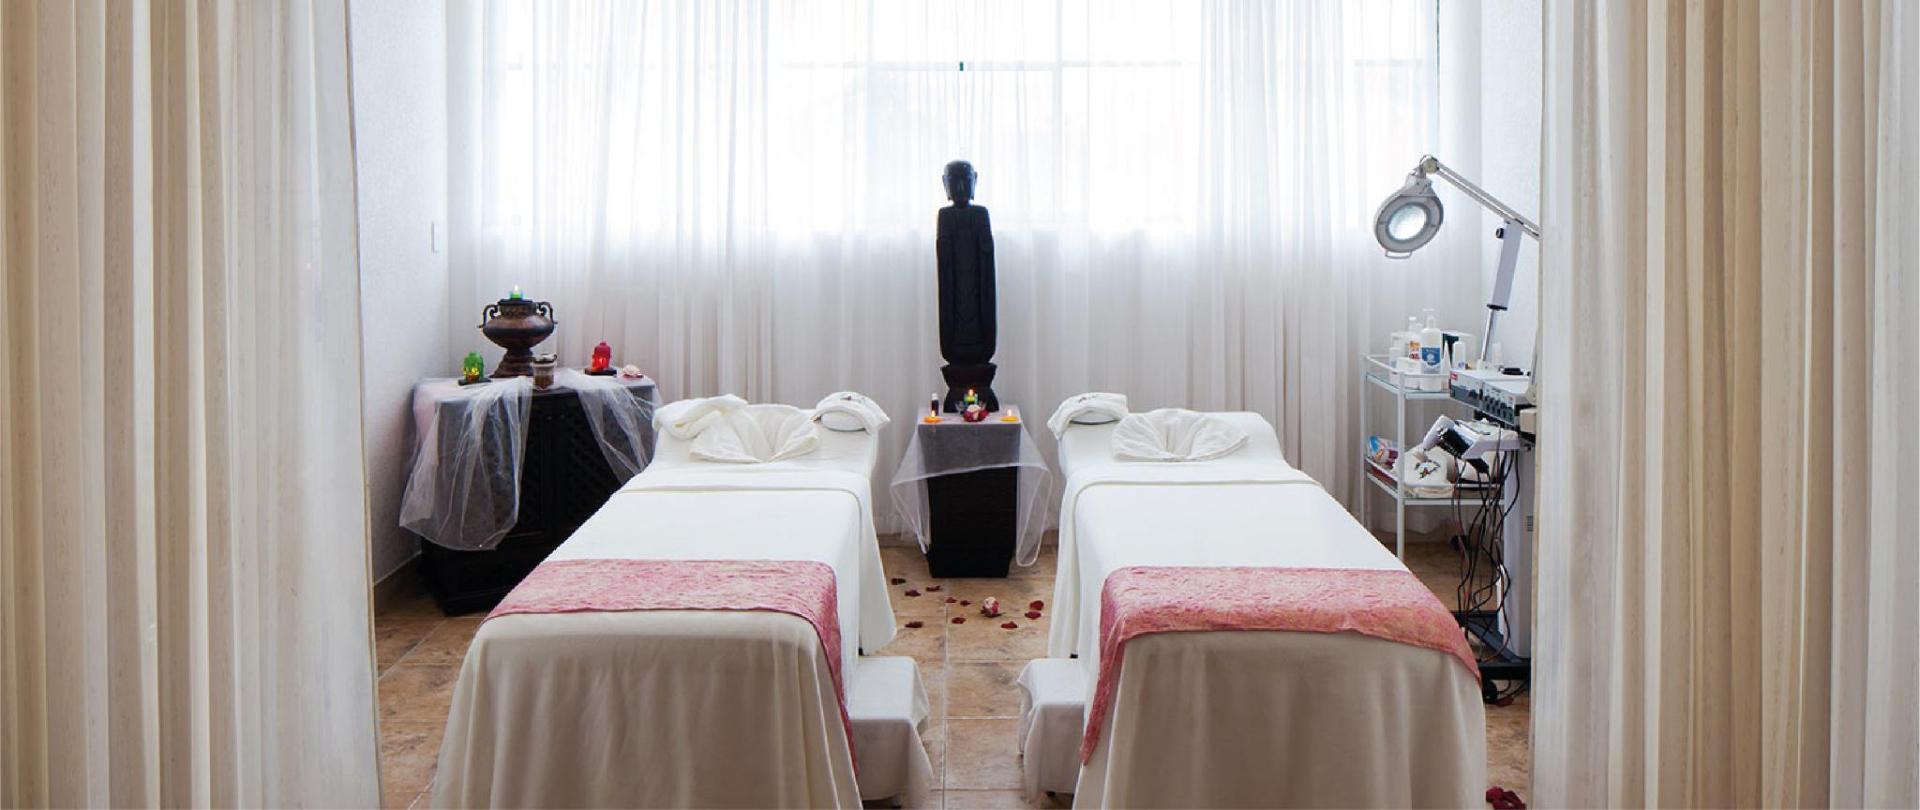 Yumbo-Spa-y-Resort-Hotel-en-Gualea-spa.jpg